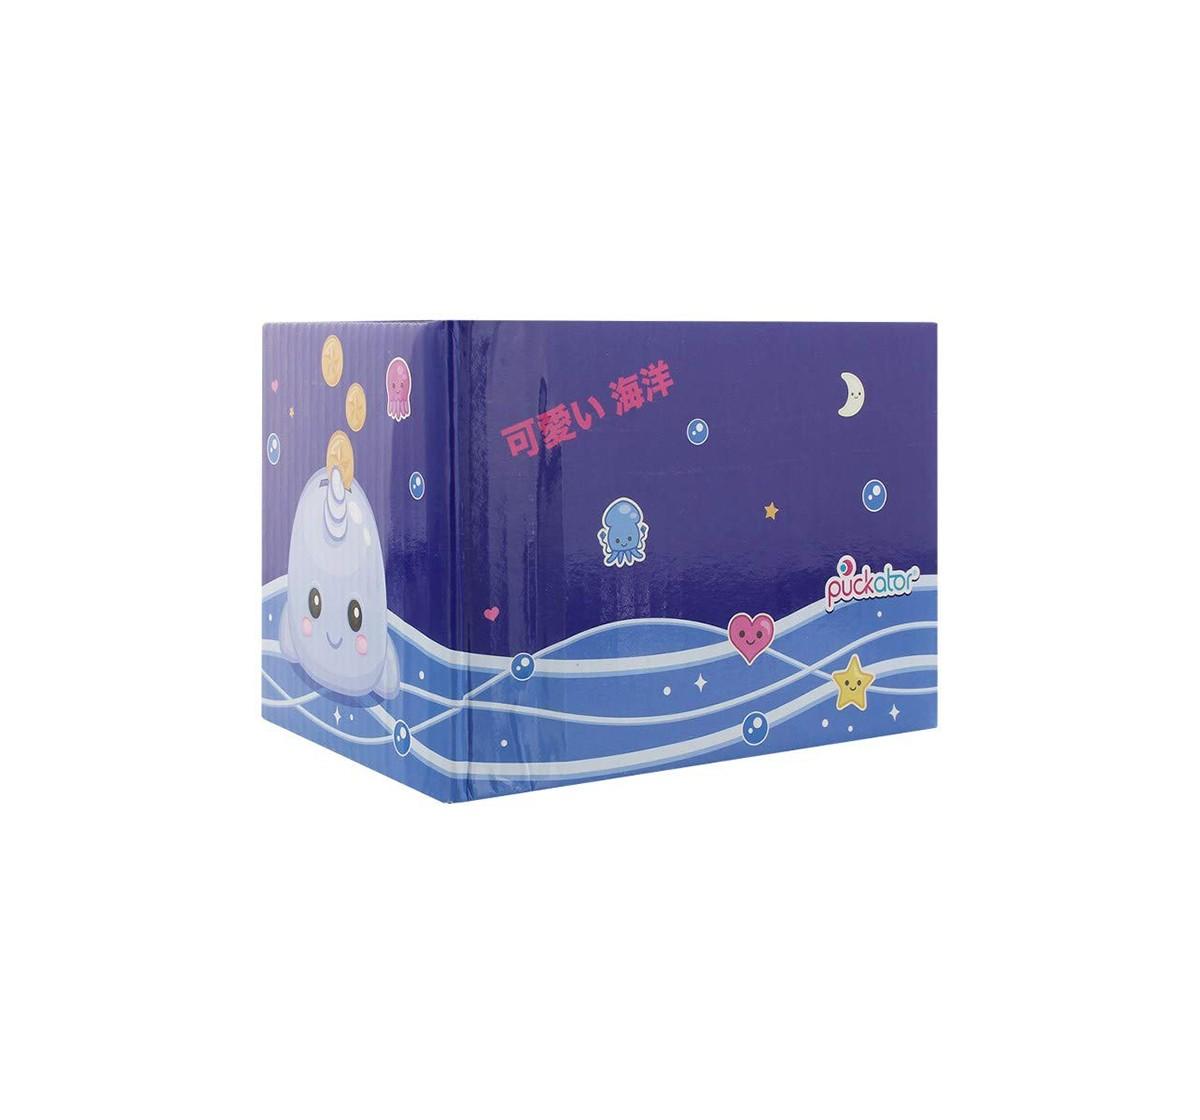 Karma Narwhal Money Box - White Novelty for Kids age 3Y+ (White)